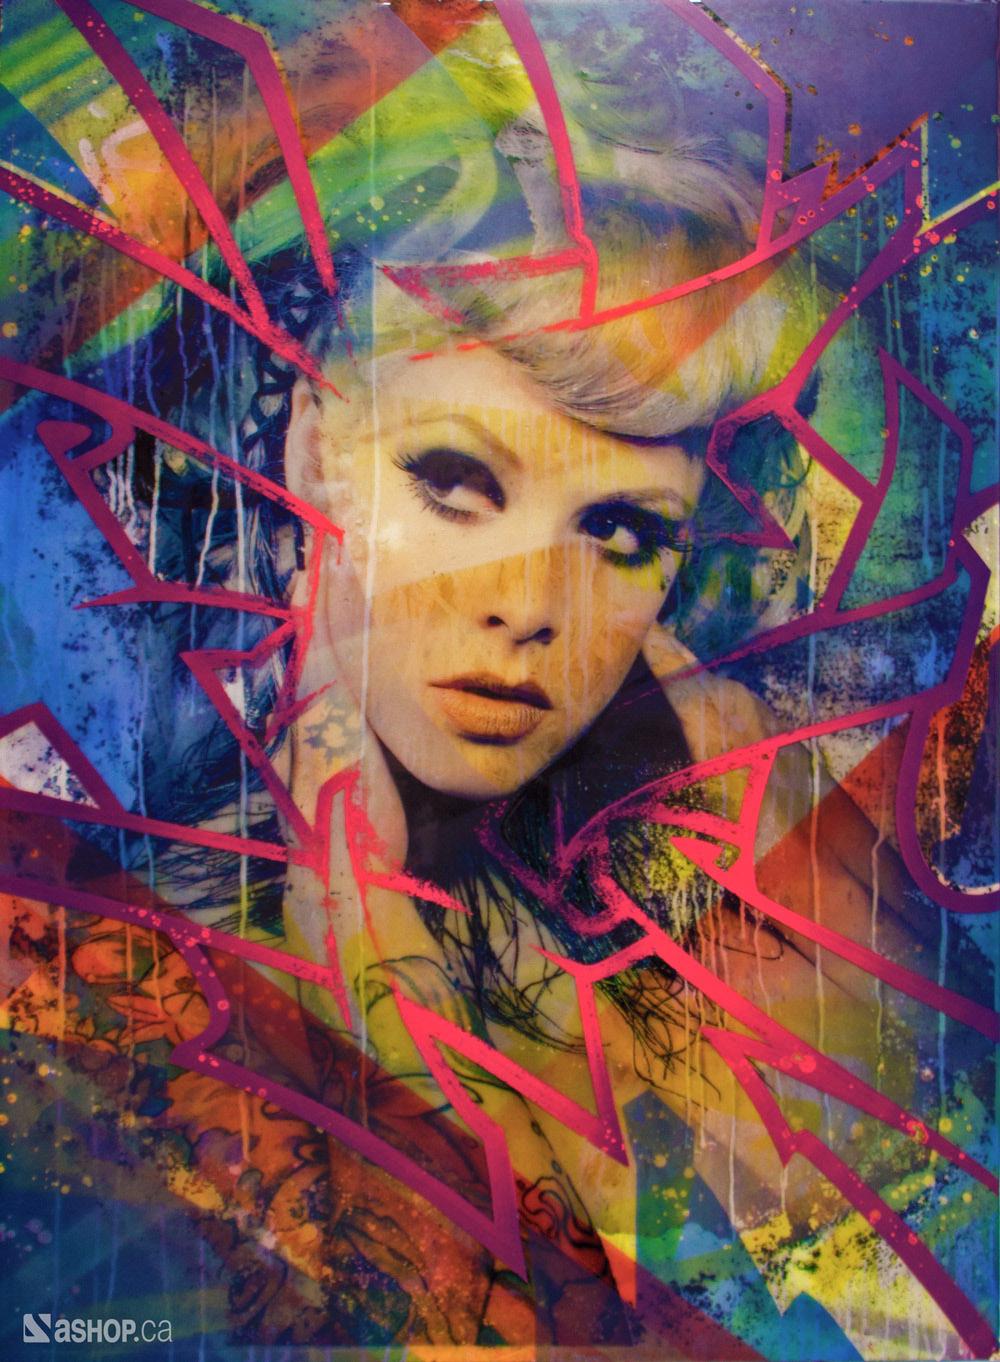 saint_roza_canvas_ashop_a'shop_mural_murales_graffiti_street_art_montreal_paint_fluke_WEB.jpg